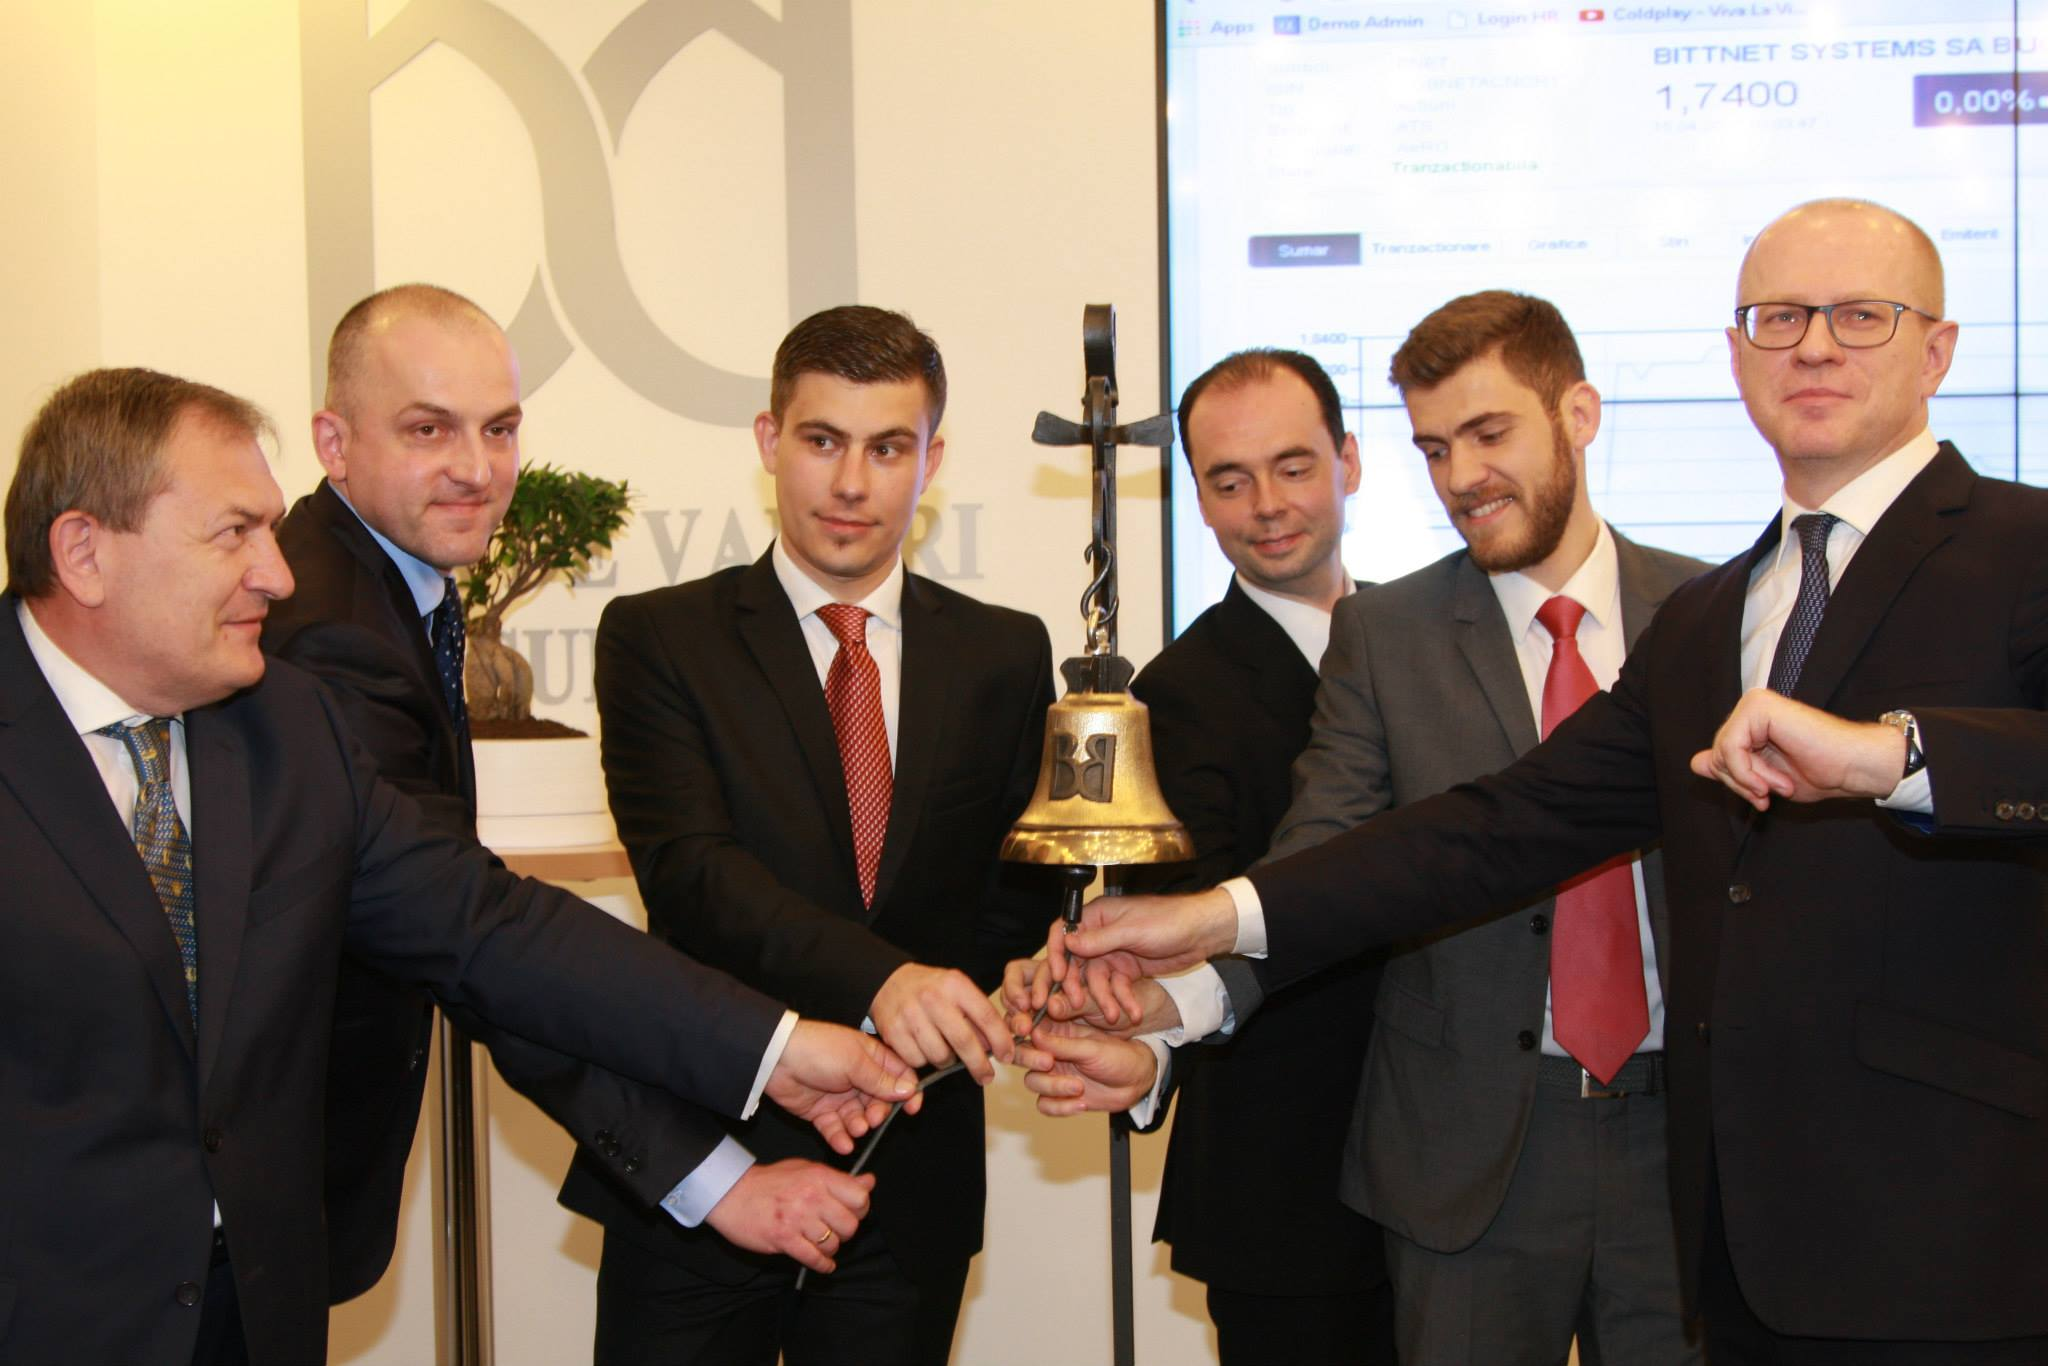 Romanian IT company Bittnet Systems to buy local peer Gecad Net